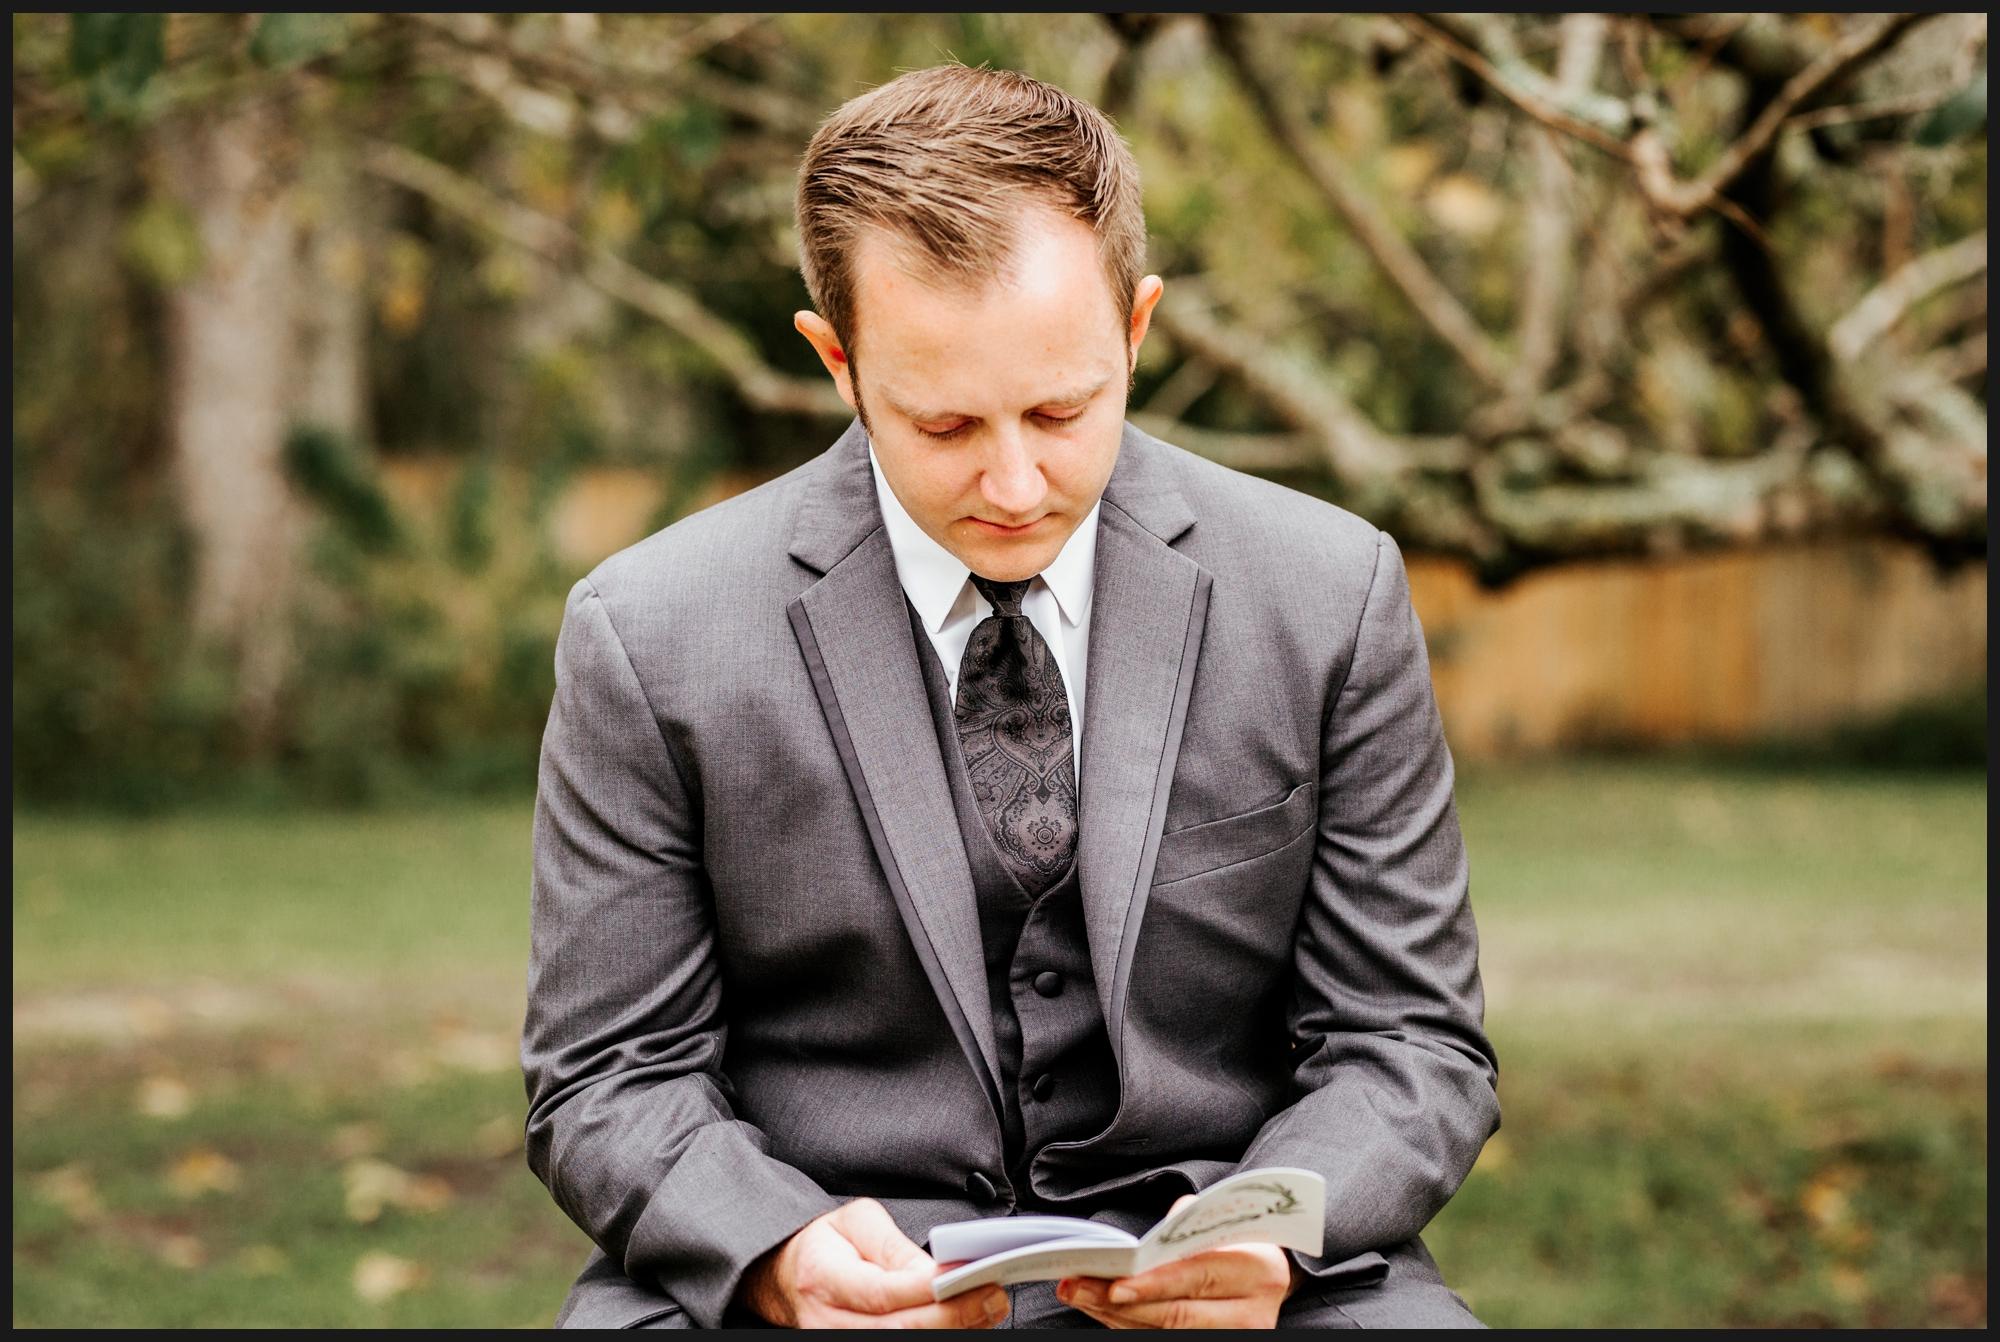 Orlando-Wedding-Photographer-destination-wedding-photographer-florida-wedding-photographer-hawaii-wedding-photographer_0504.jpg